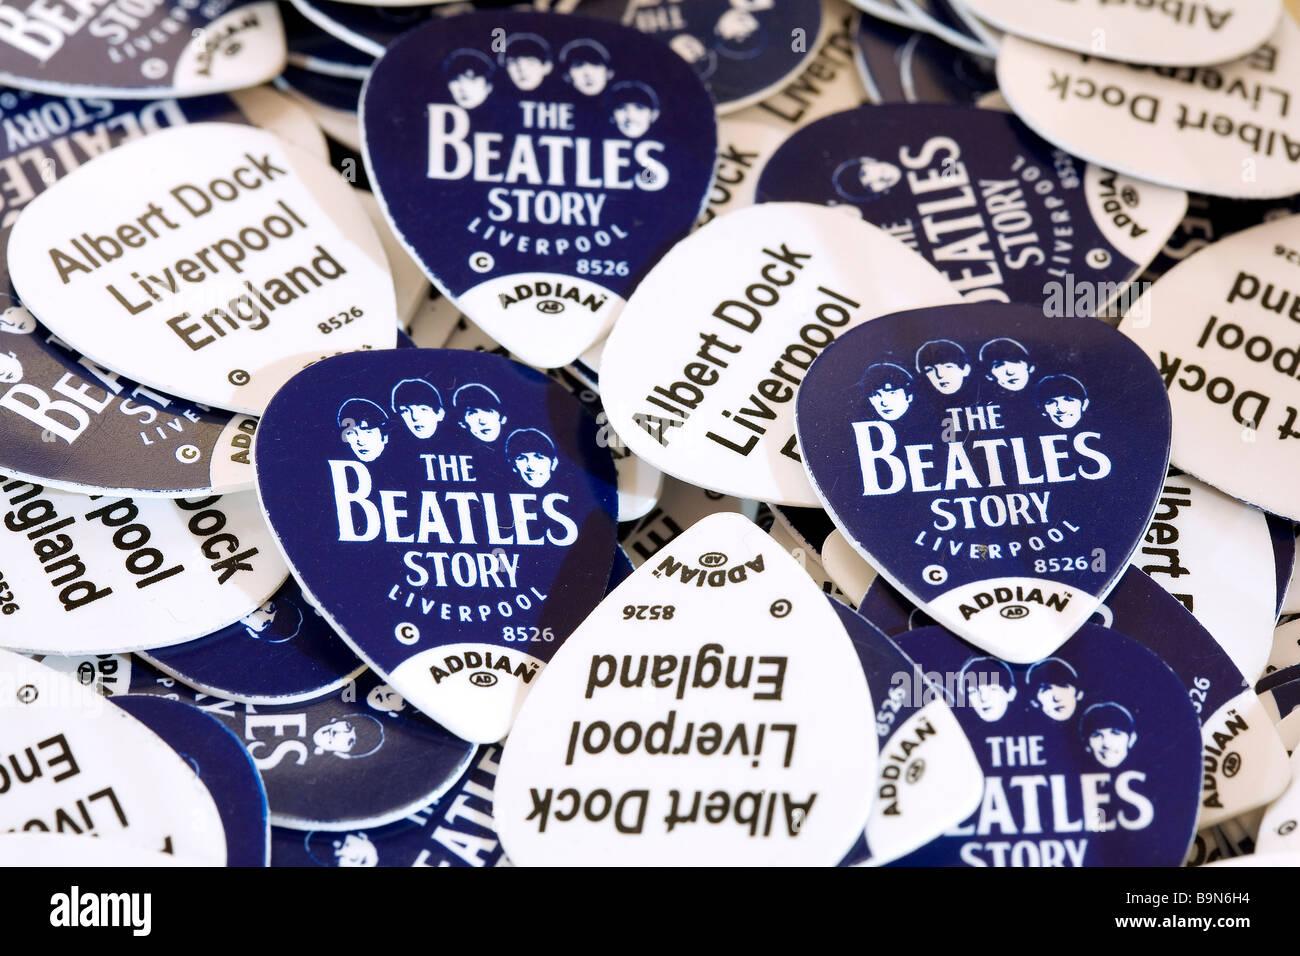 United Kingdom, Liverpool, Albert Dock, The Beatles Story, souvenir shop, plectrums - Stock Image